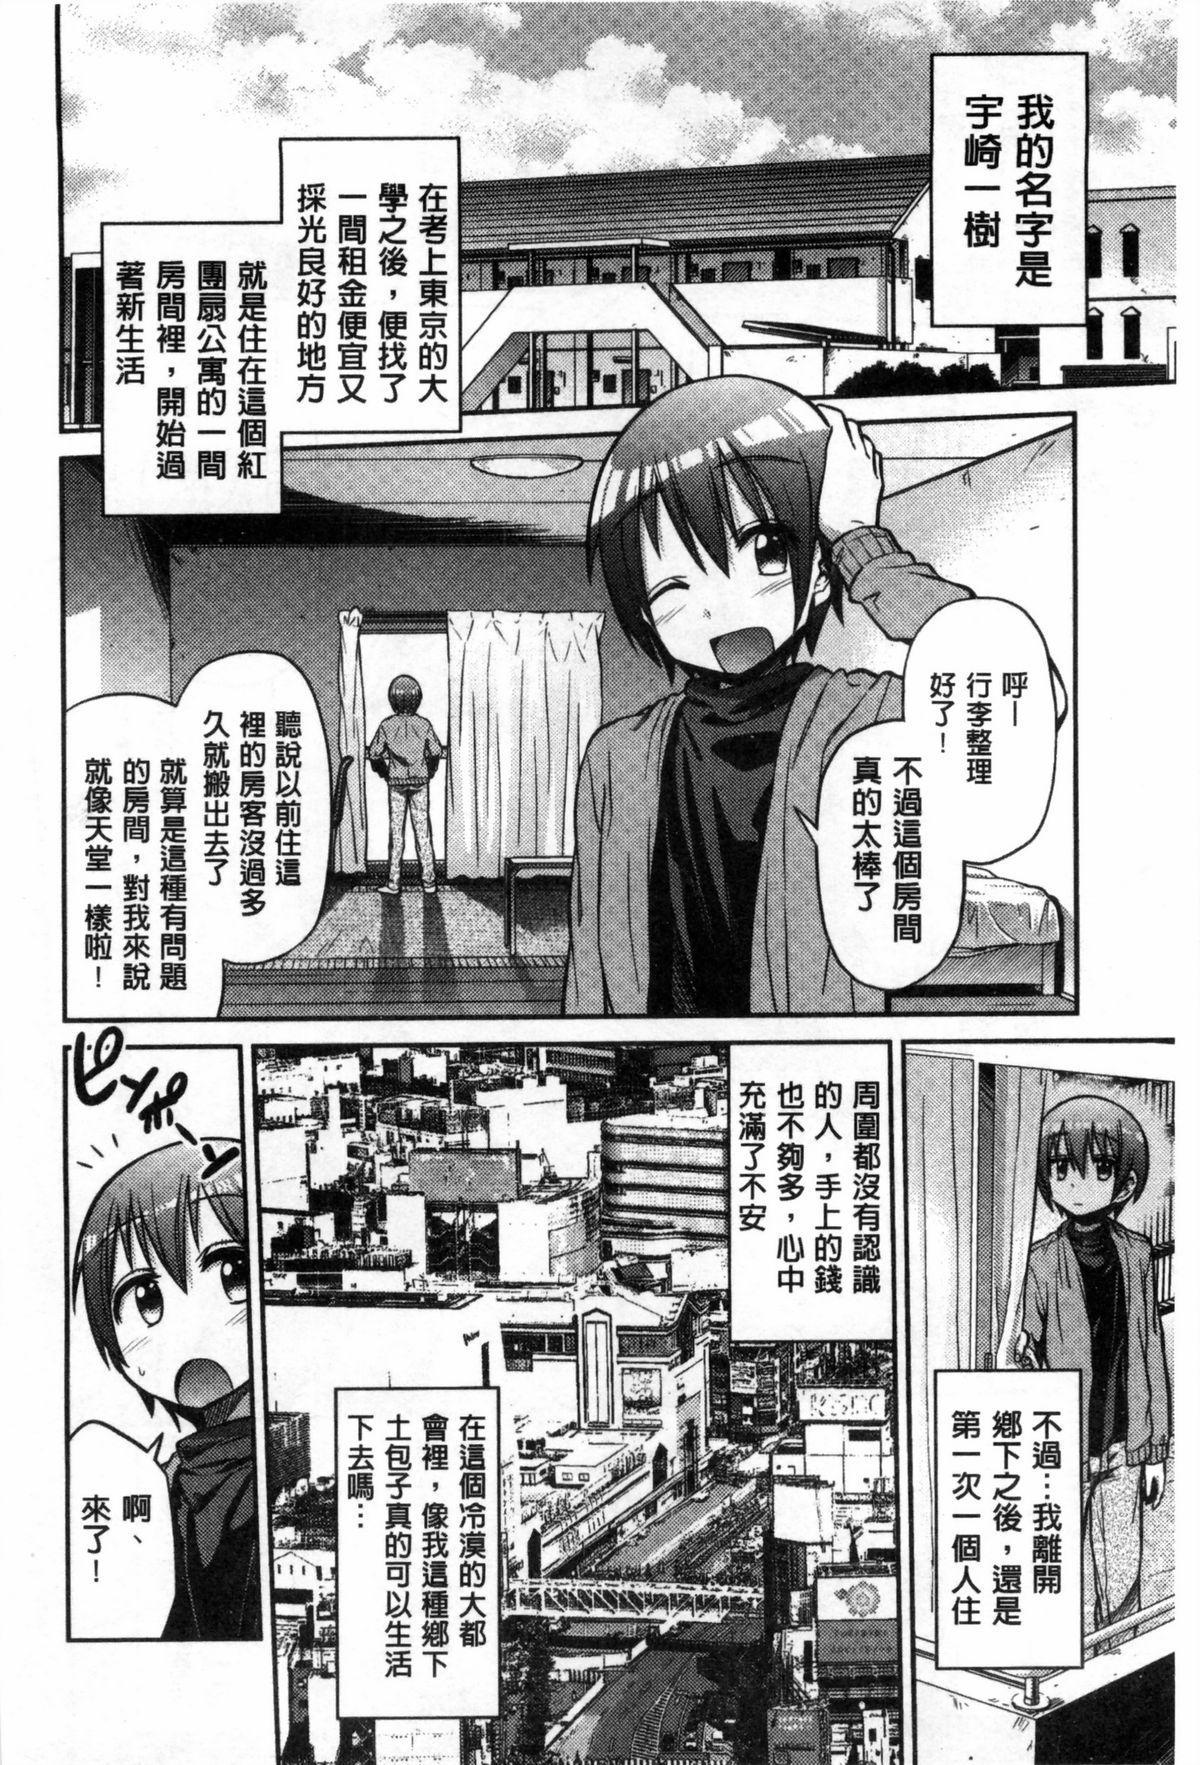 Man x Koi - Ero Manga de Hajimaru Koi no Plot   A漫×戀情 由情色漫畫所萌生的戀之物語 116